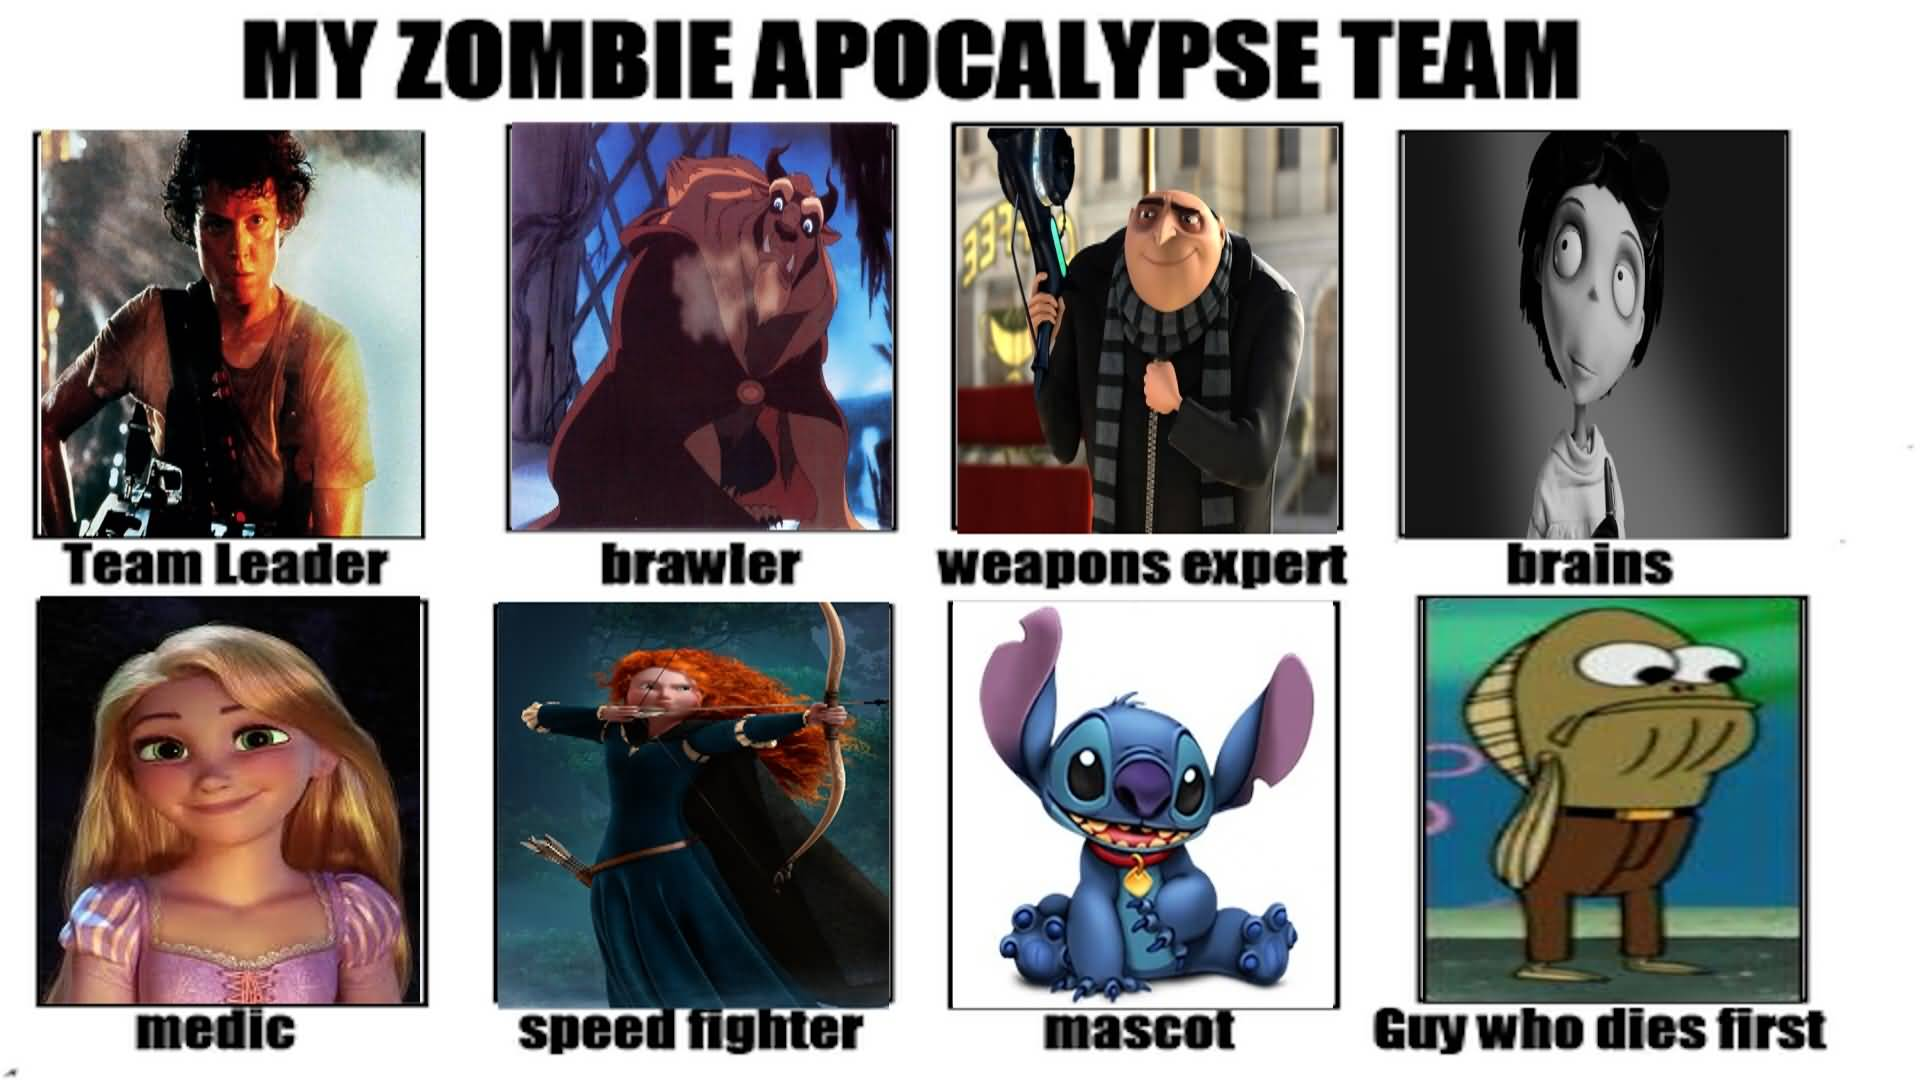 Zombie Apocalypse Team Meme Funny Joke 03